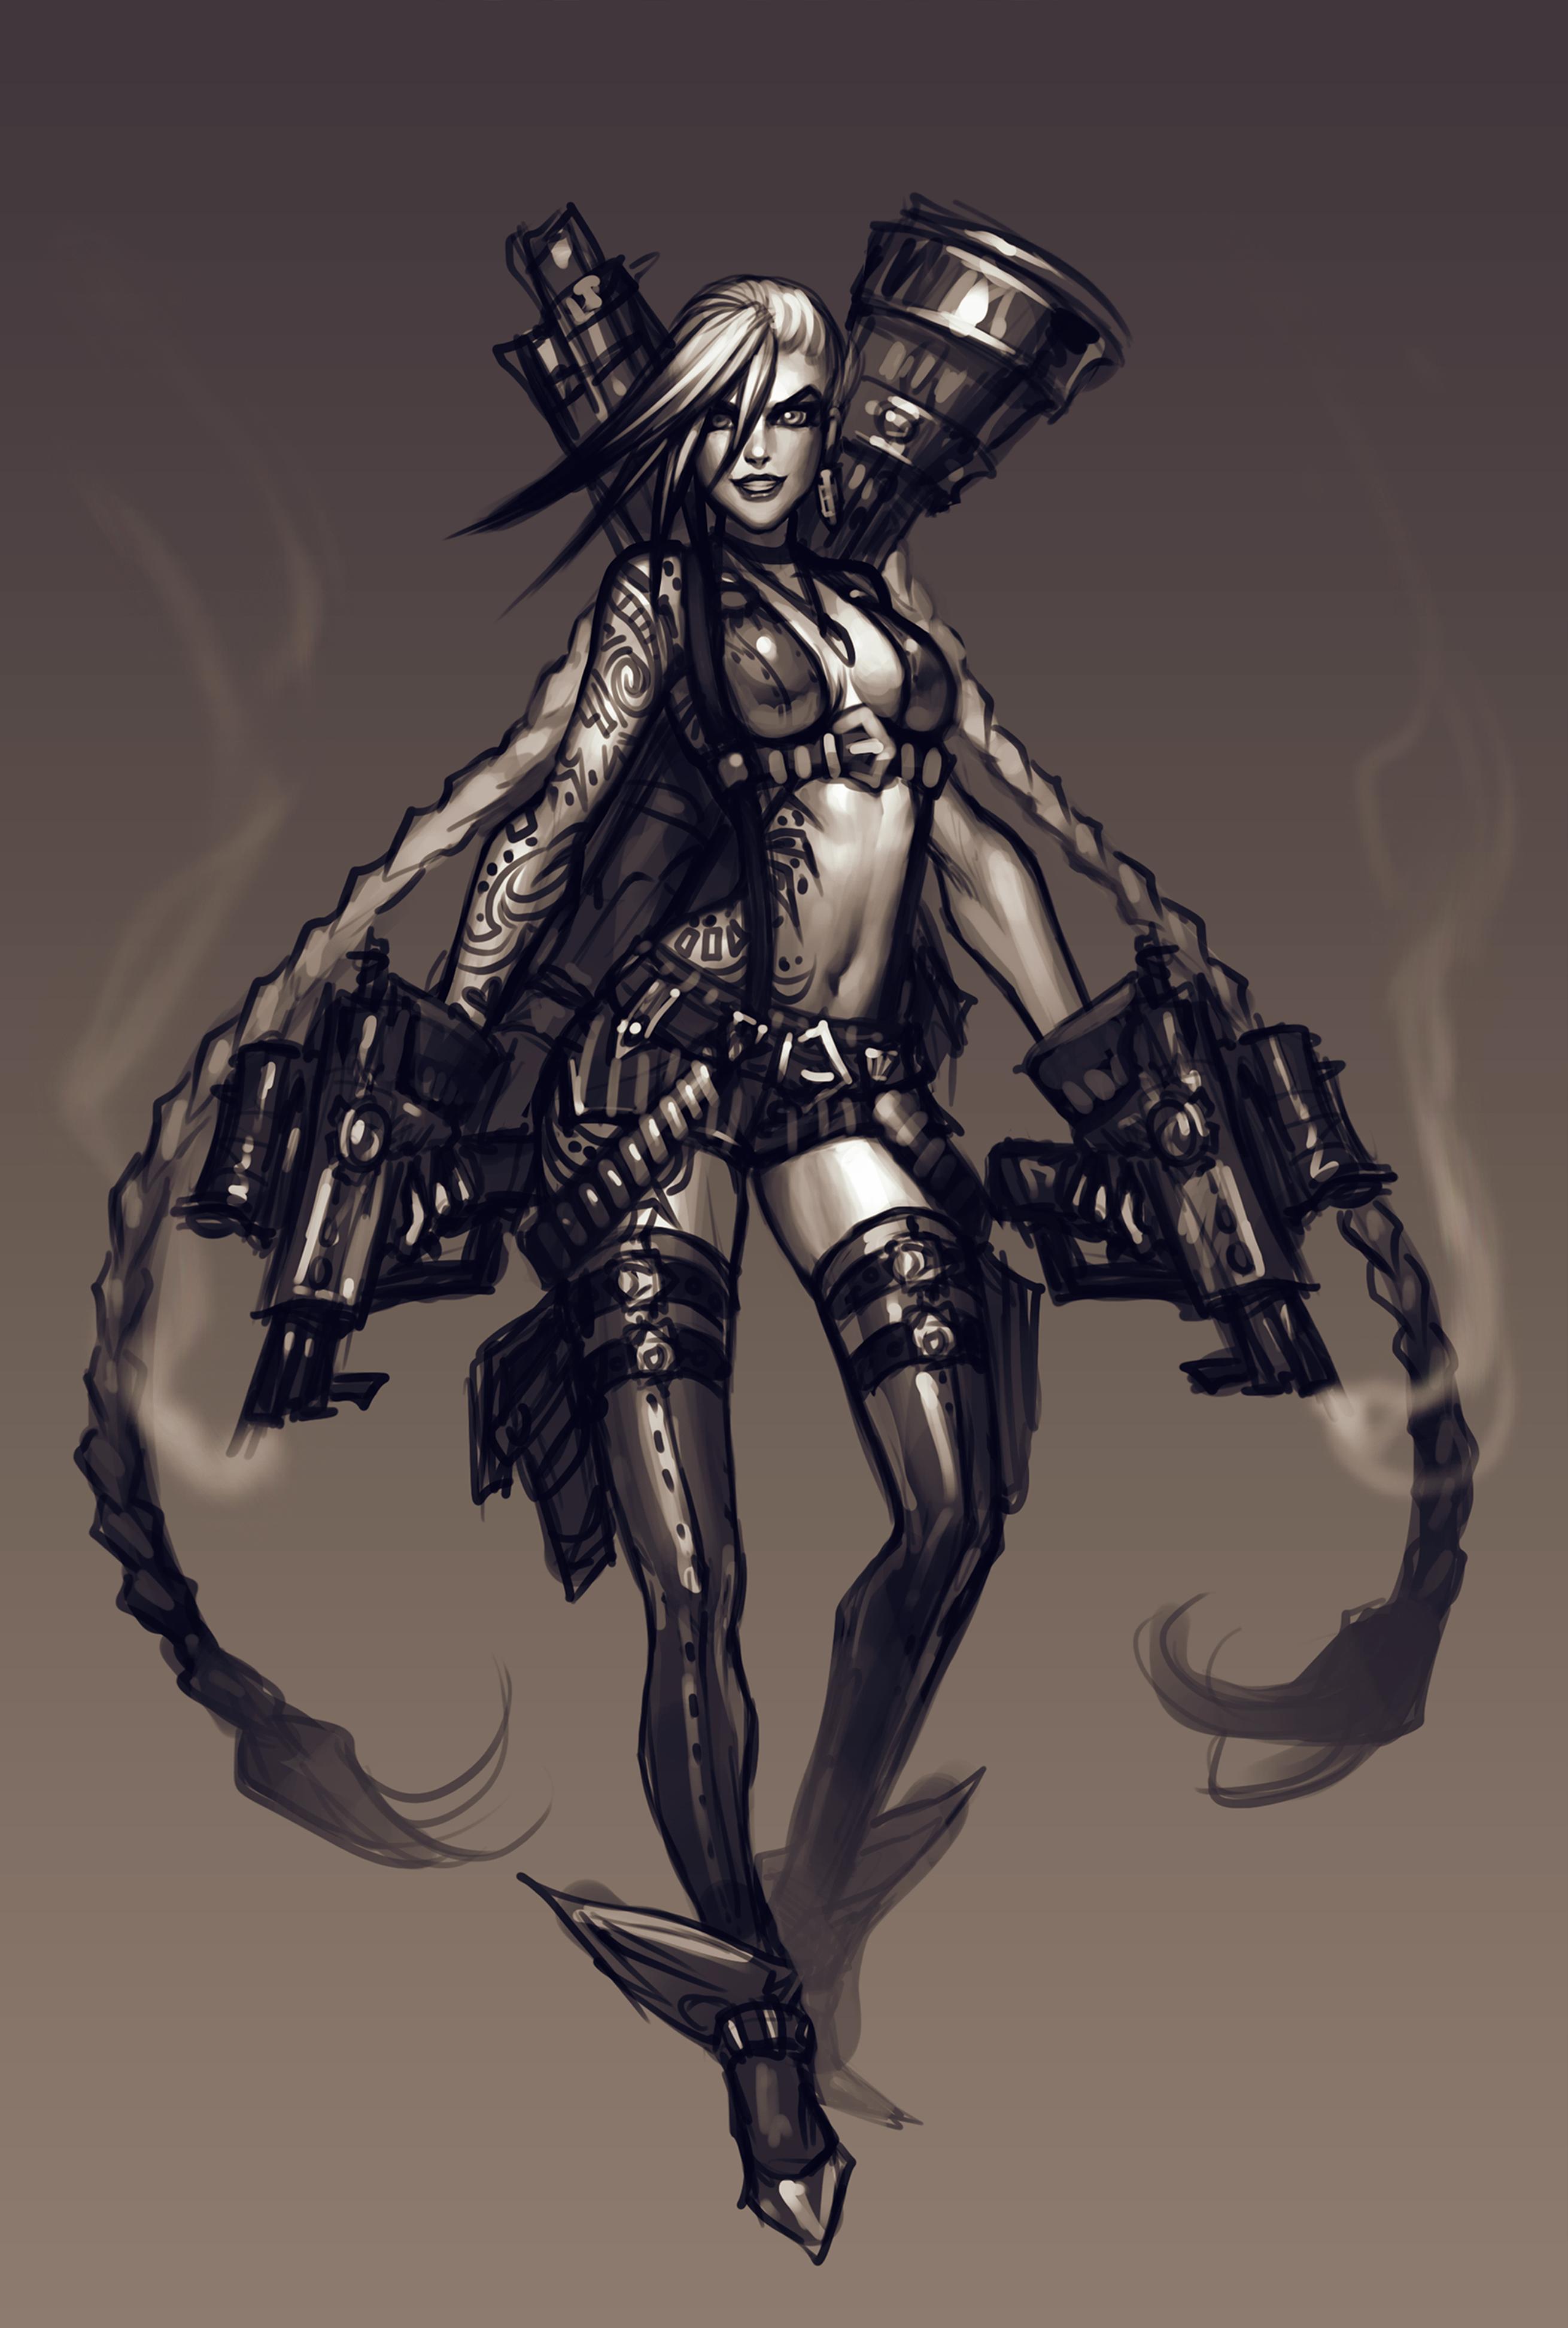 Original Concept Art for Psycho Arsenal (Jinx)